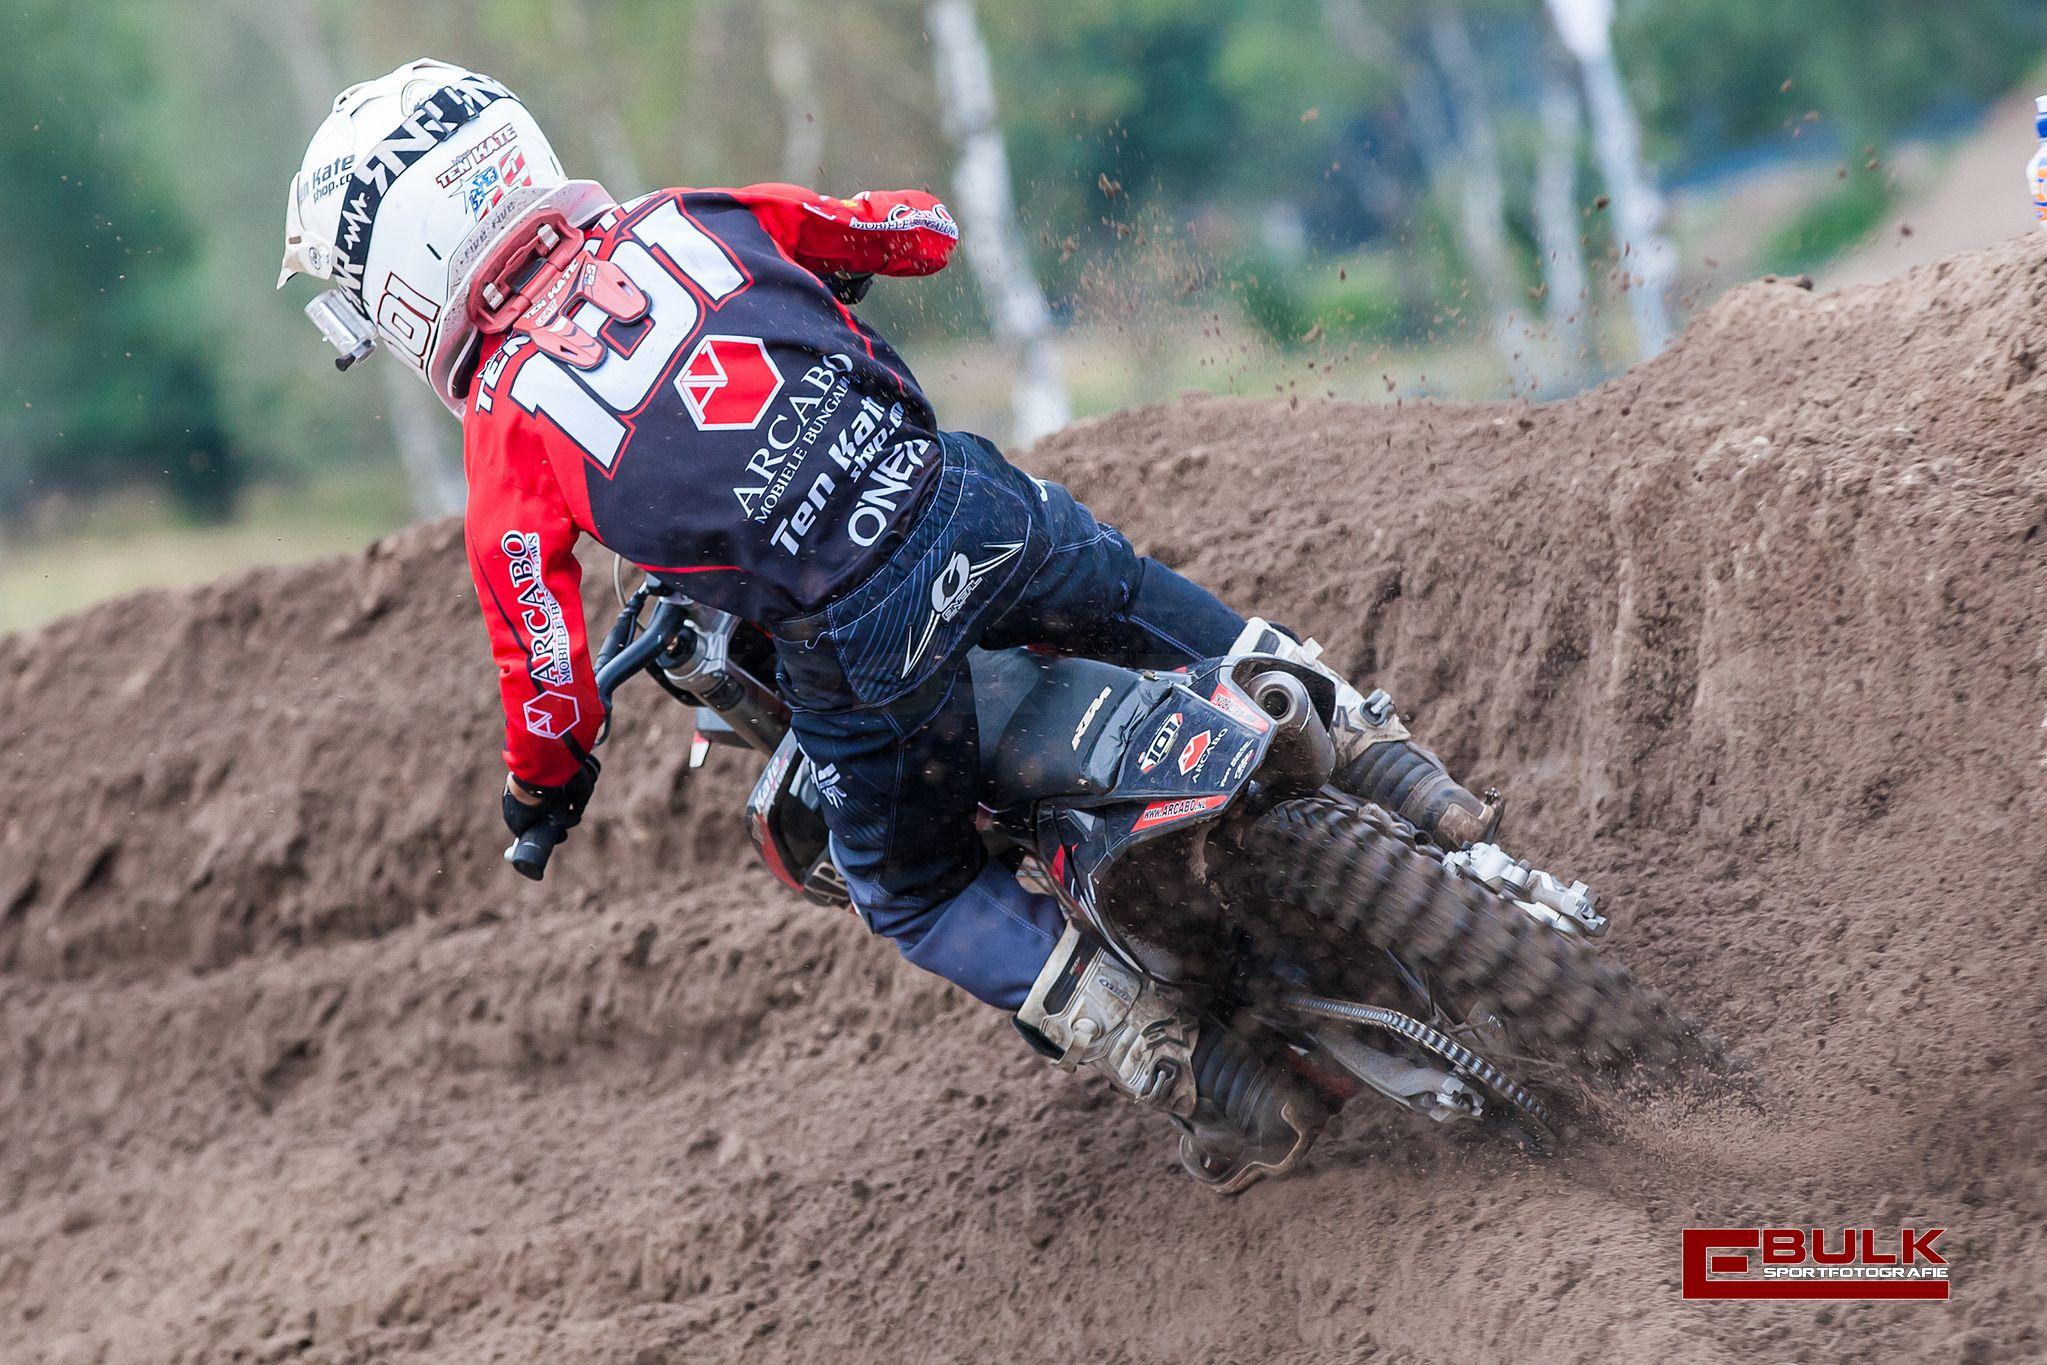 ebs_0109-ed_bulk_sportfotografie